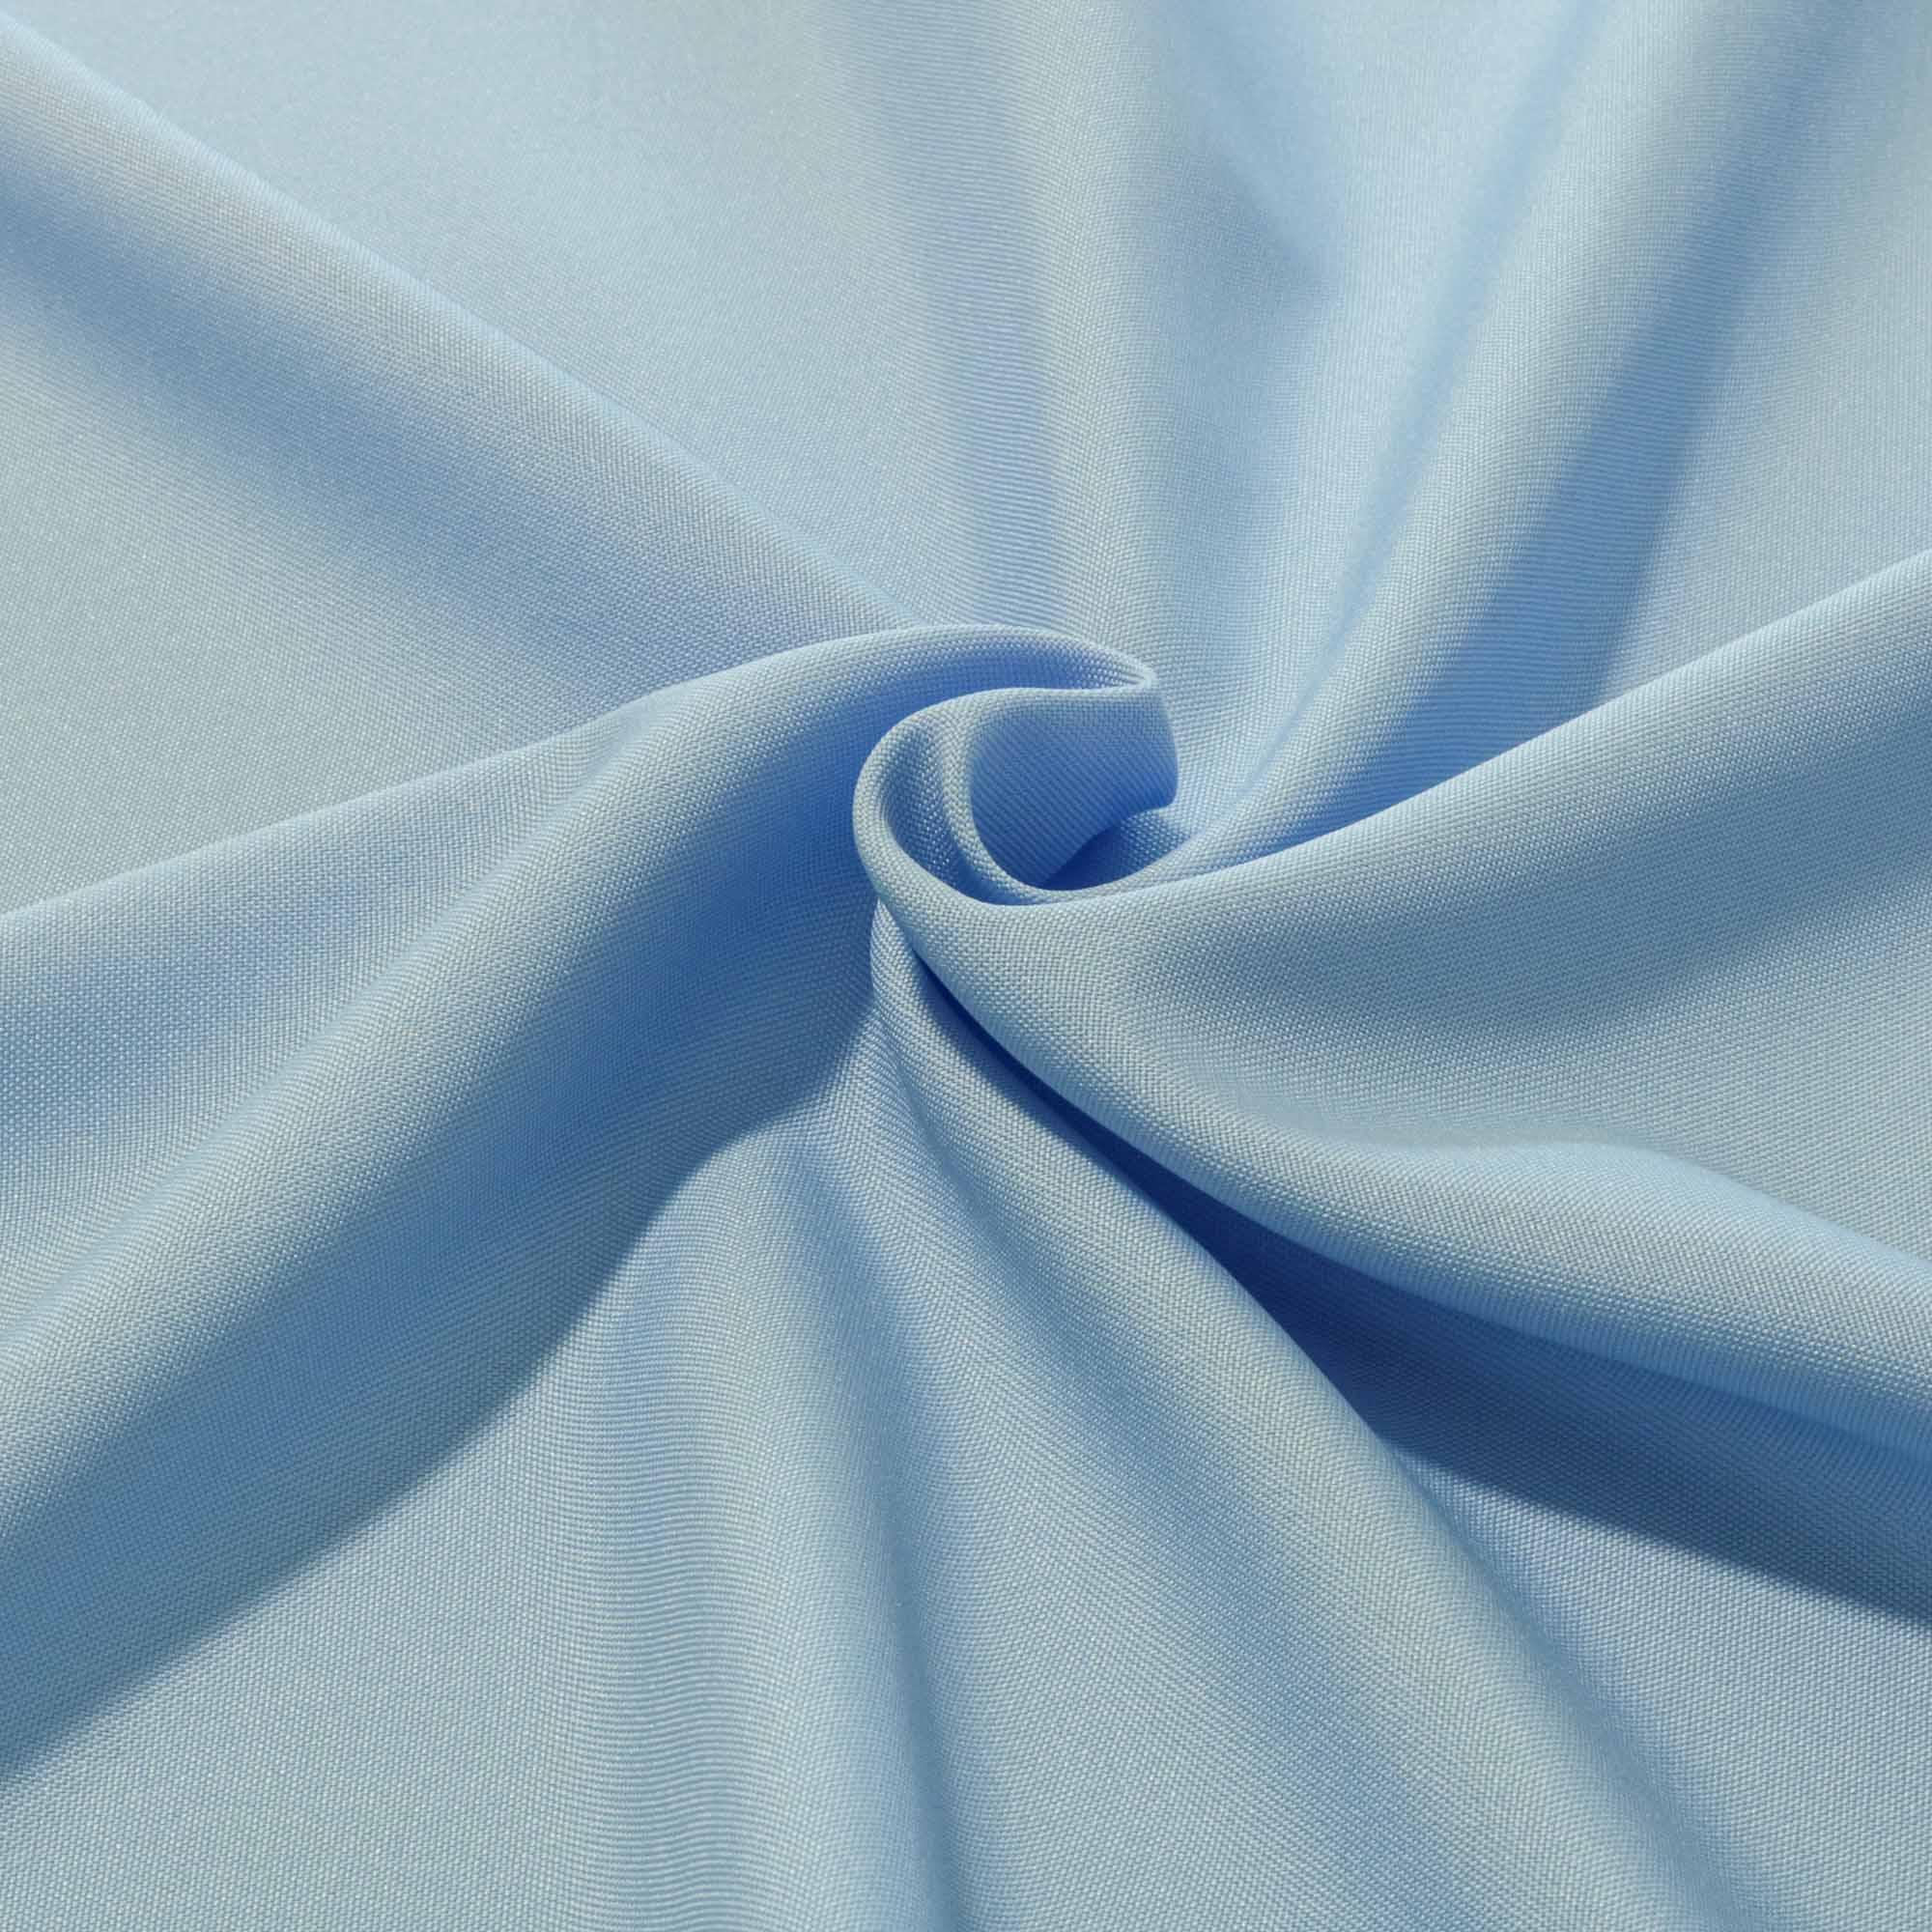 Tecido Oxford Liso 100% Poliester 1,50 m Largura Azul